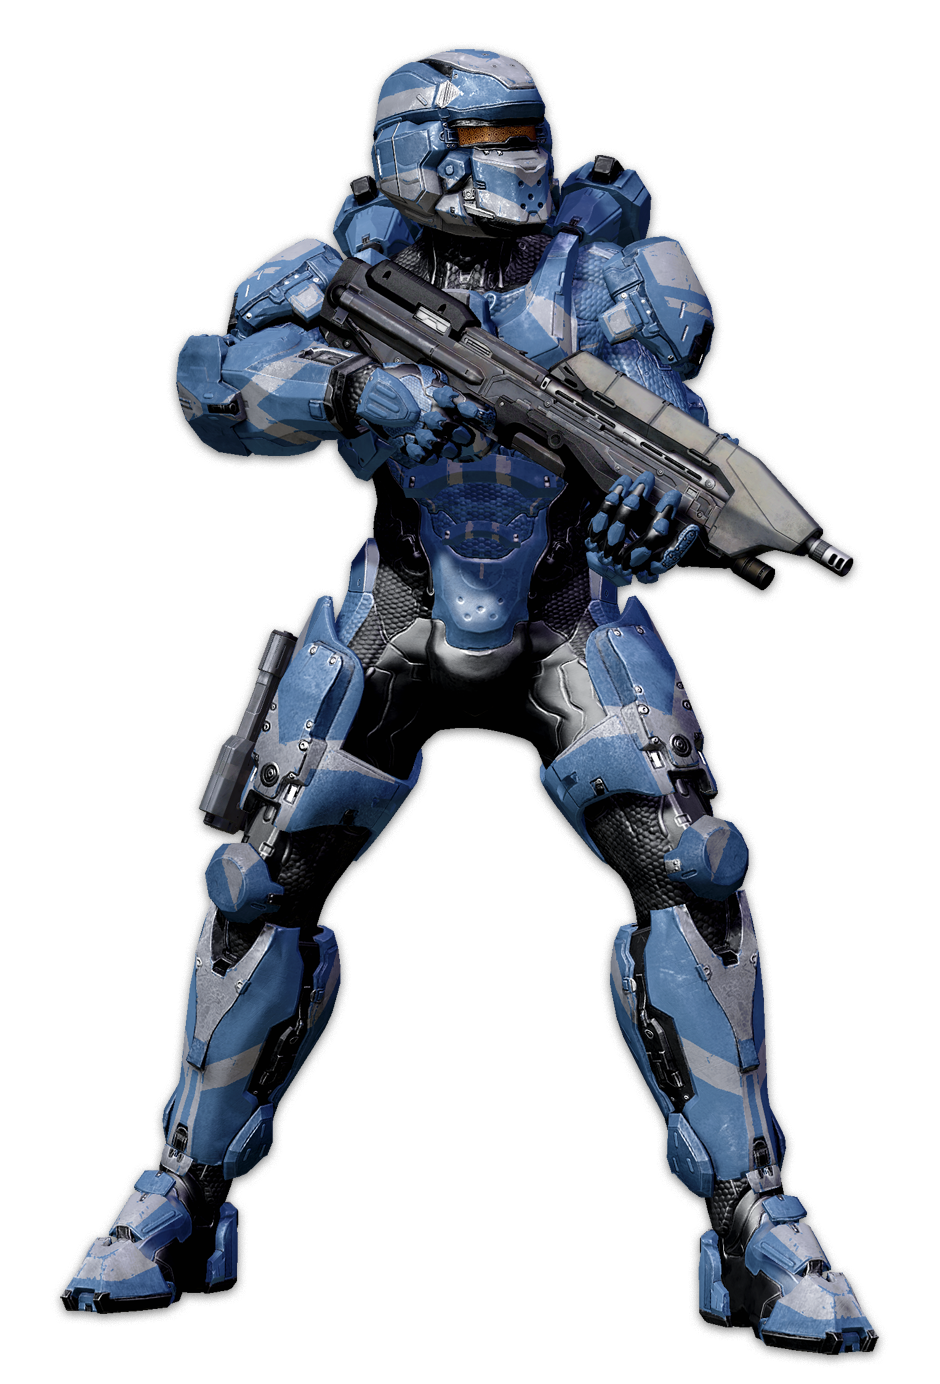 SPARTAN-IV program | Halo Nation | Fandom powered by Wikia